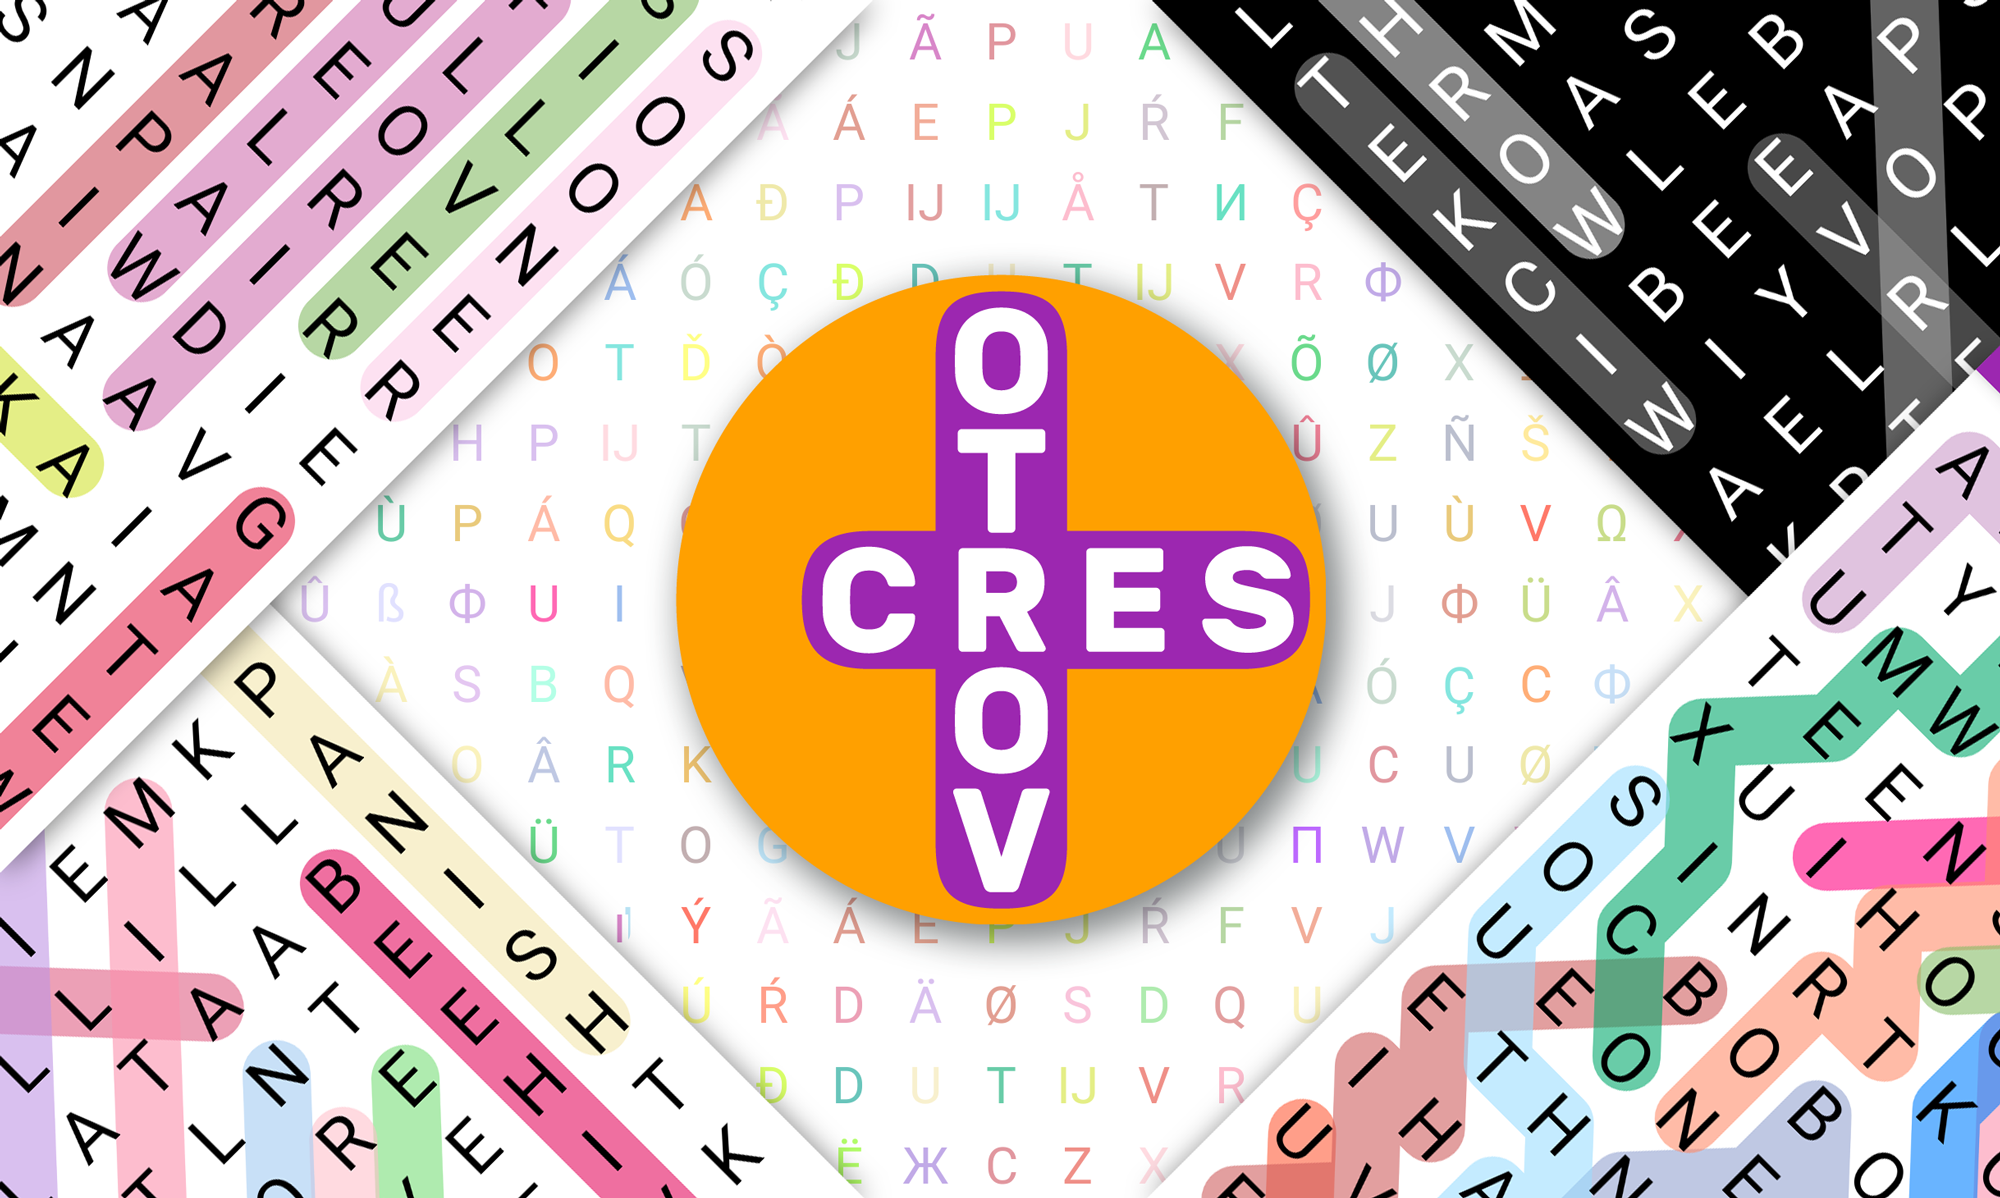 examples of the Vortoserc app's unique word search puzzles